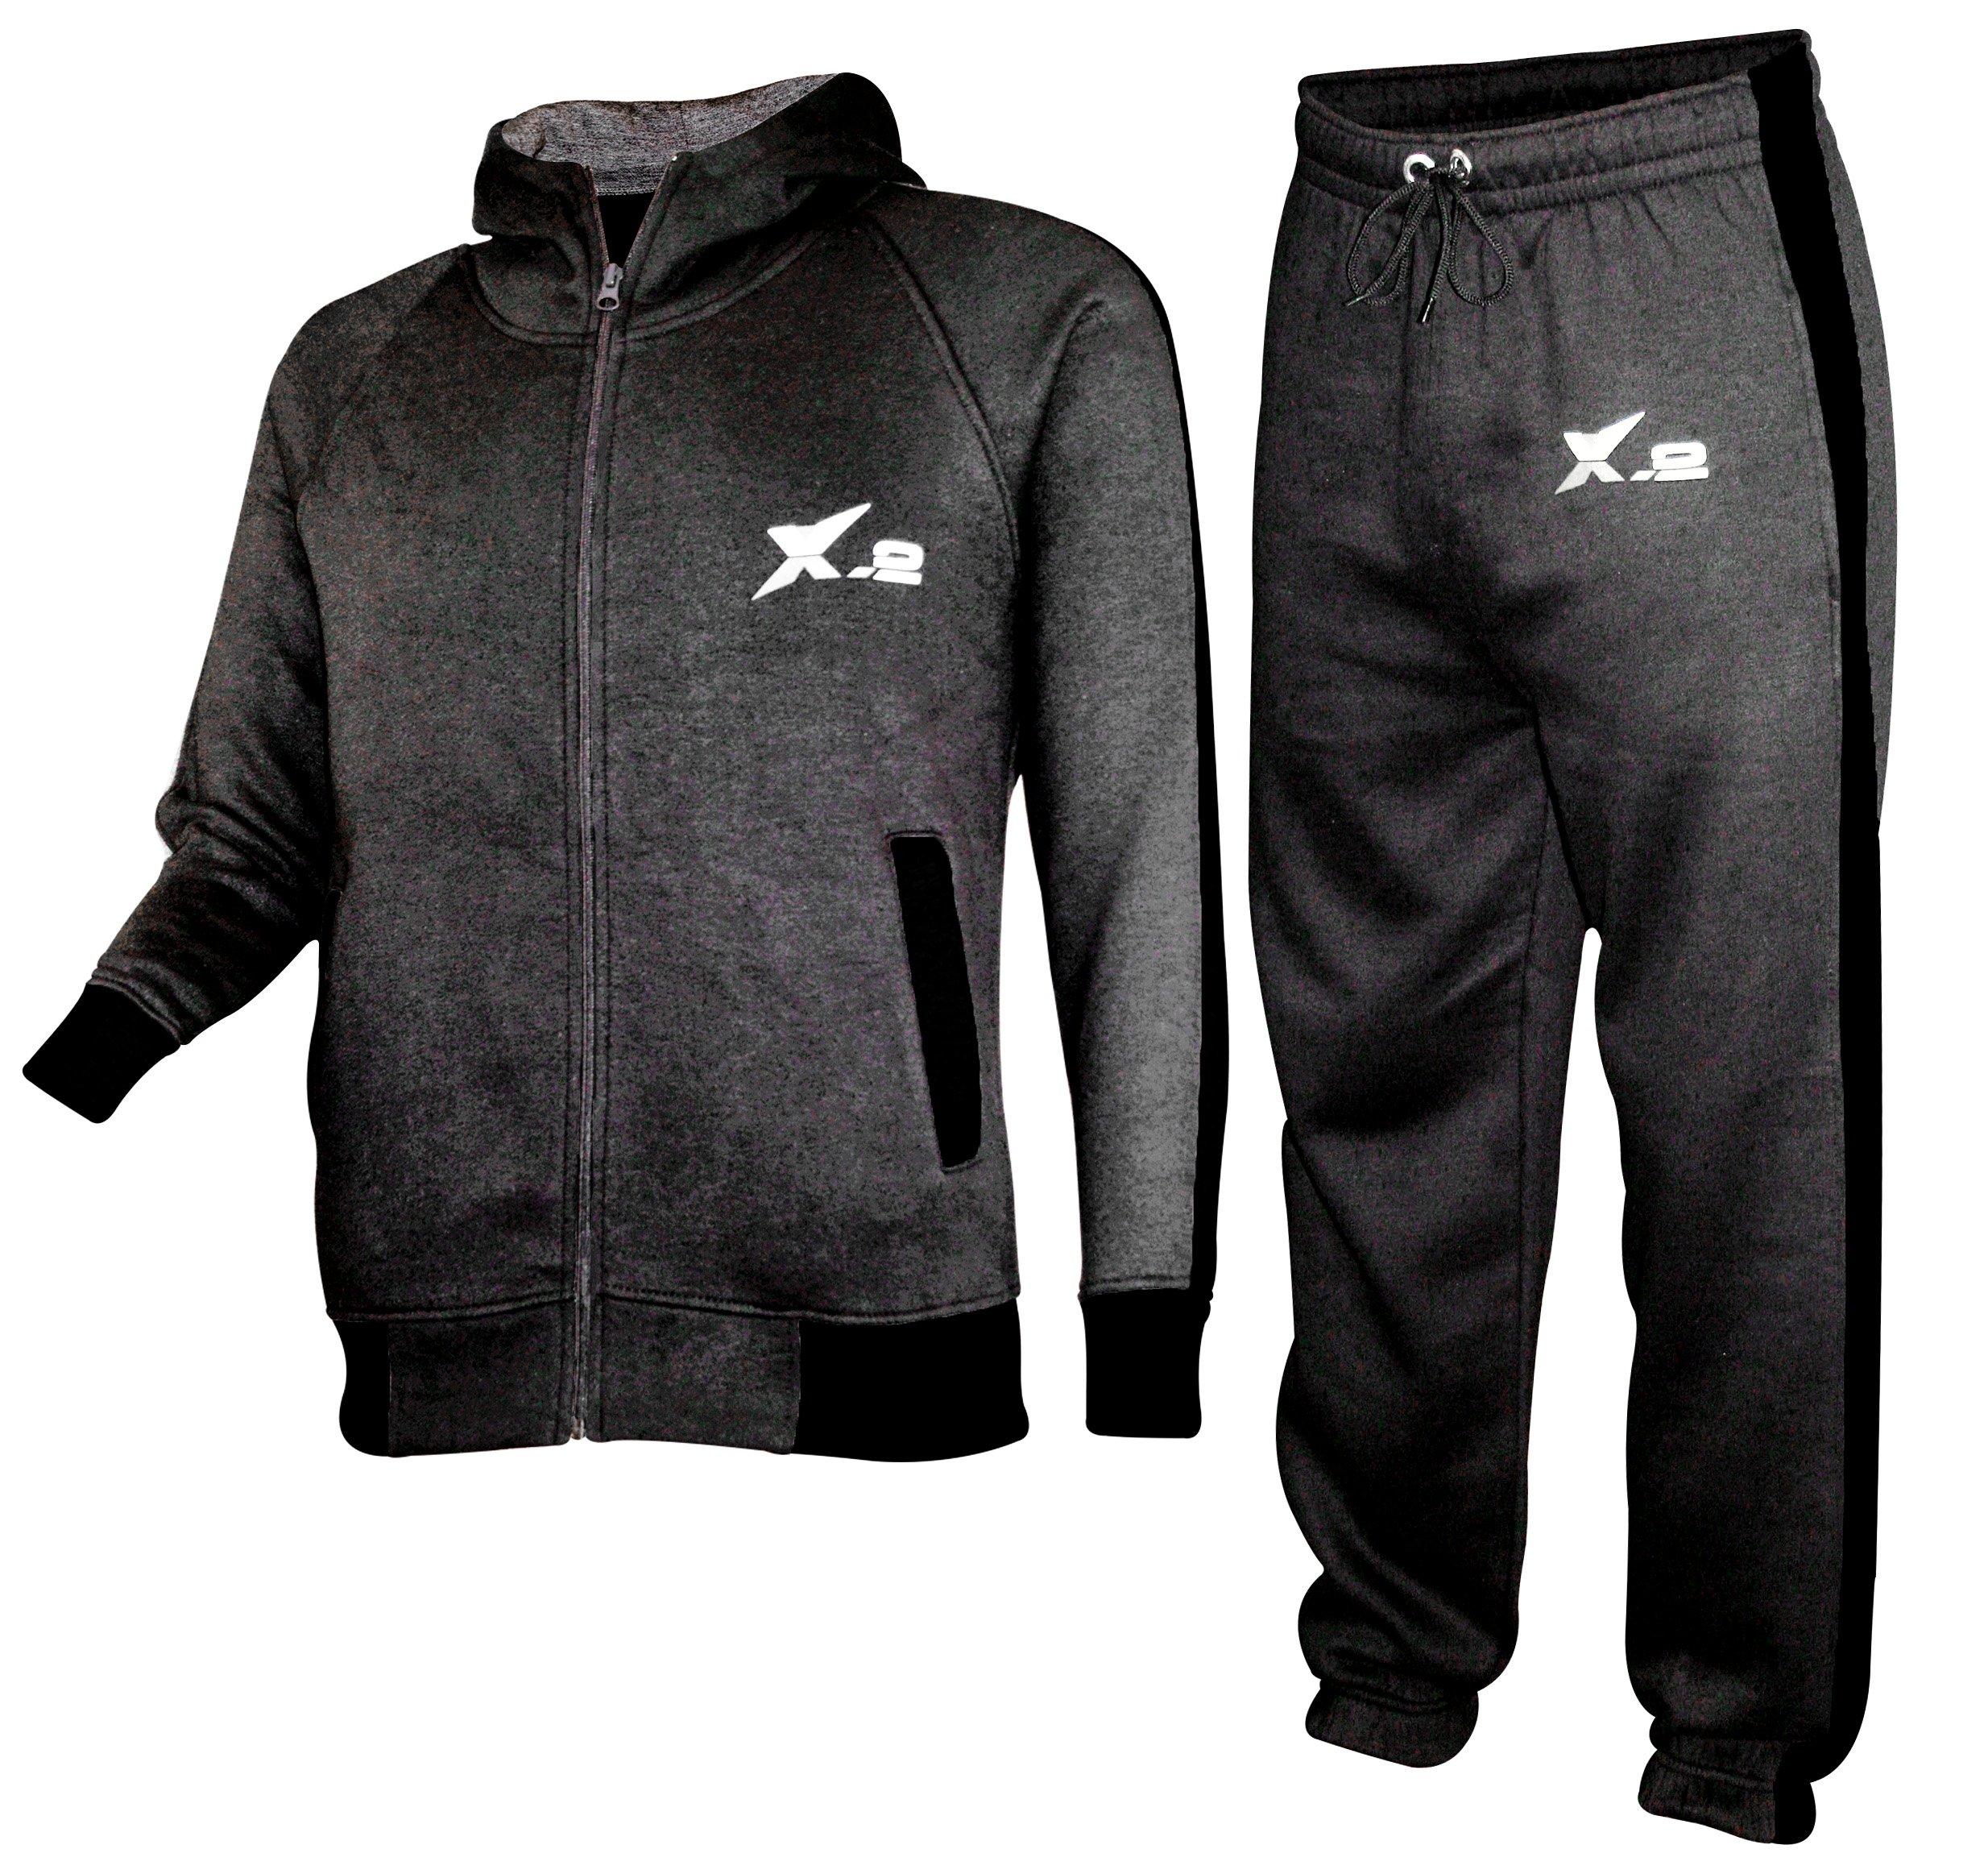 X-2 Mens Athletic Fleece Tracksuit Jogging Sweatsuit Activewear Hooded Top Charcoal XXL